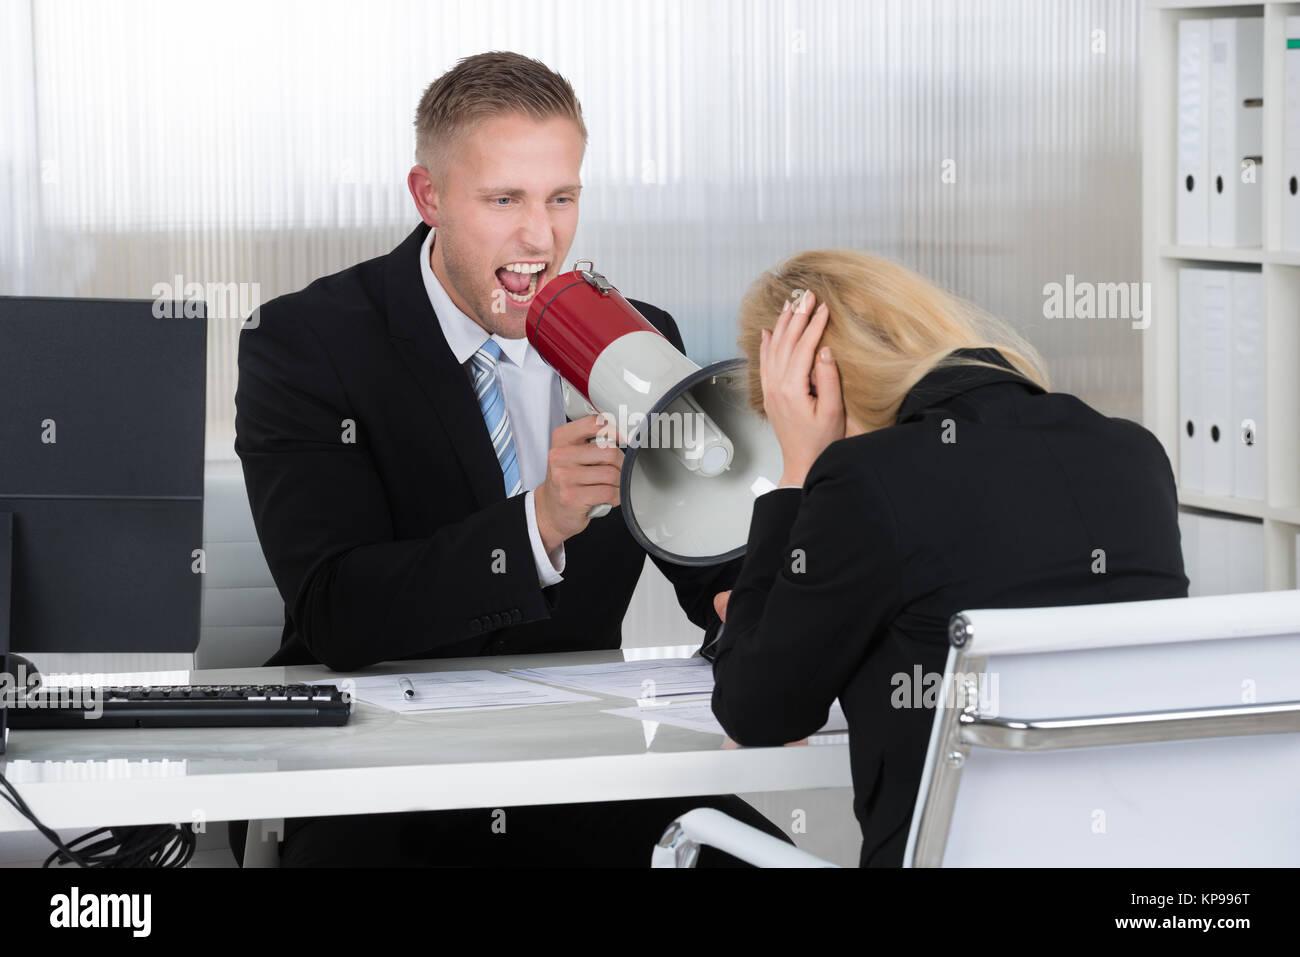 Boss Shouting At Businesswoman Through Loudspeaker In Office - Stock Image